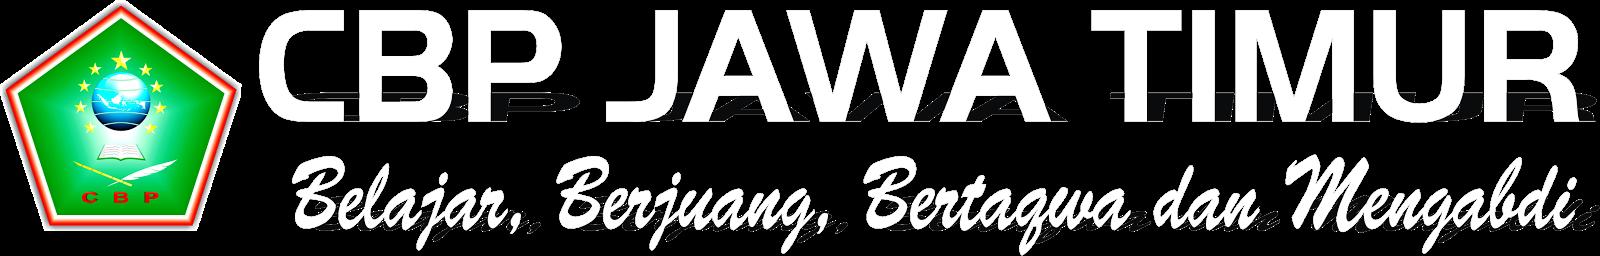 CBP JAWA TIMUR